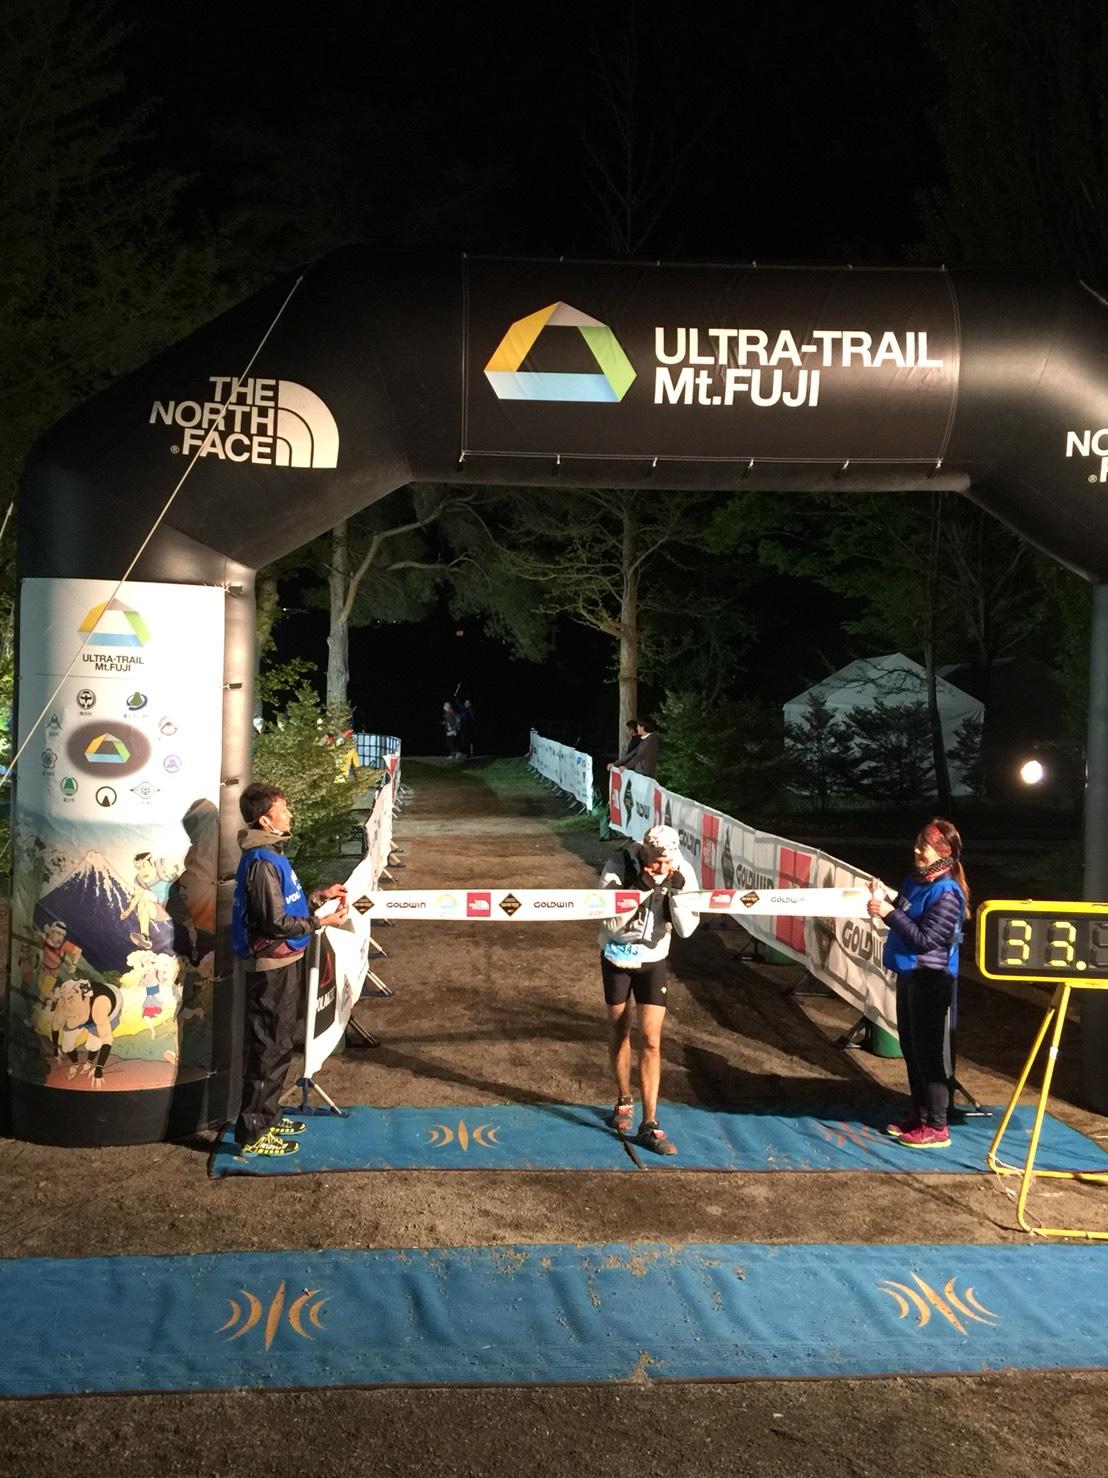 UTMF - 3776d - Fuji Outdoor Sports